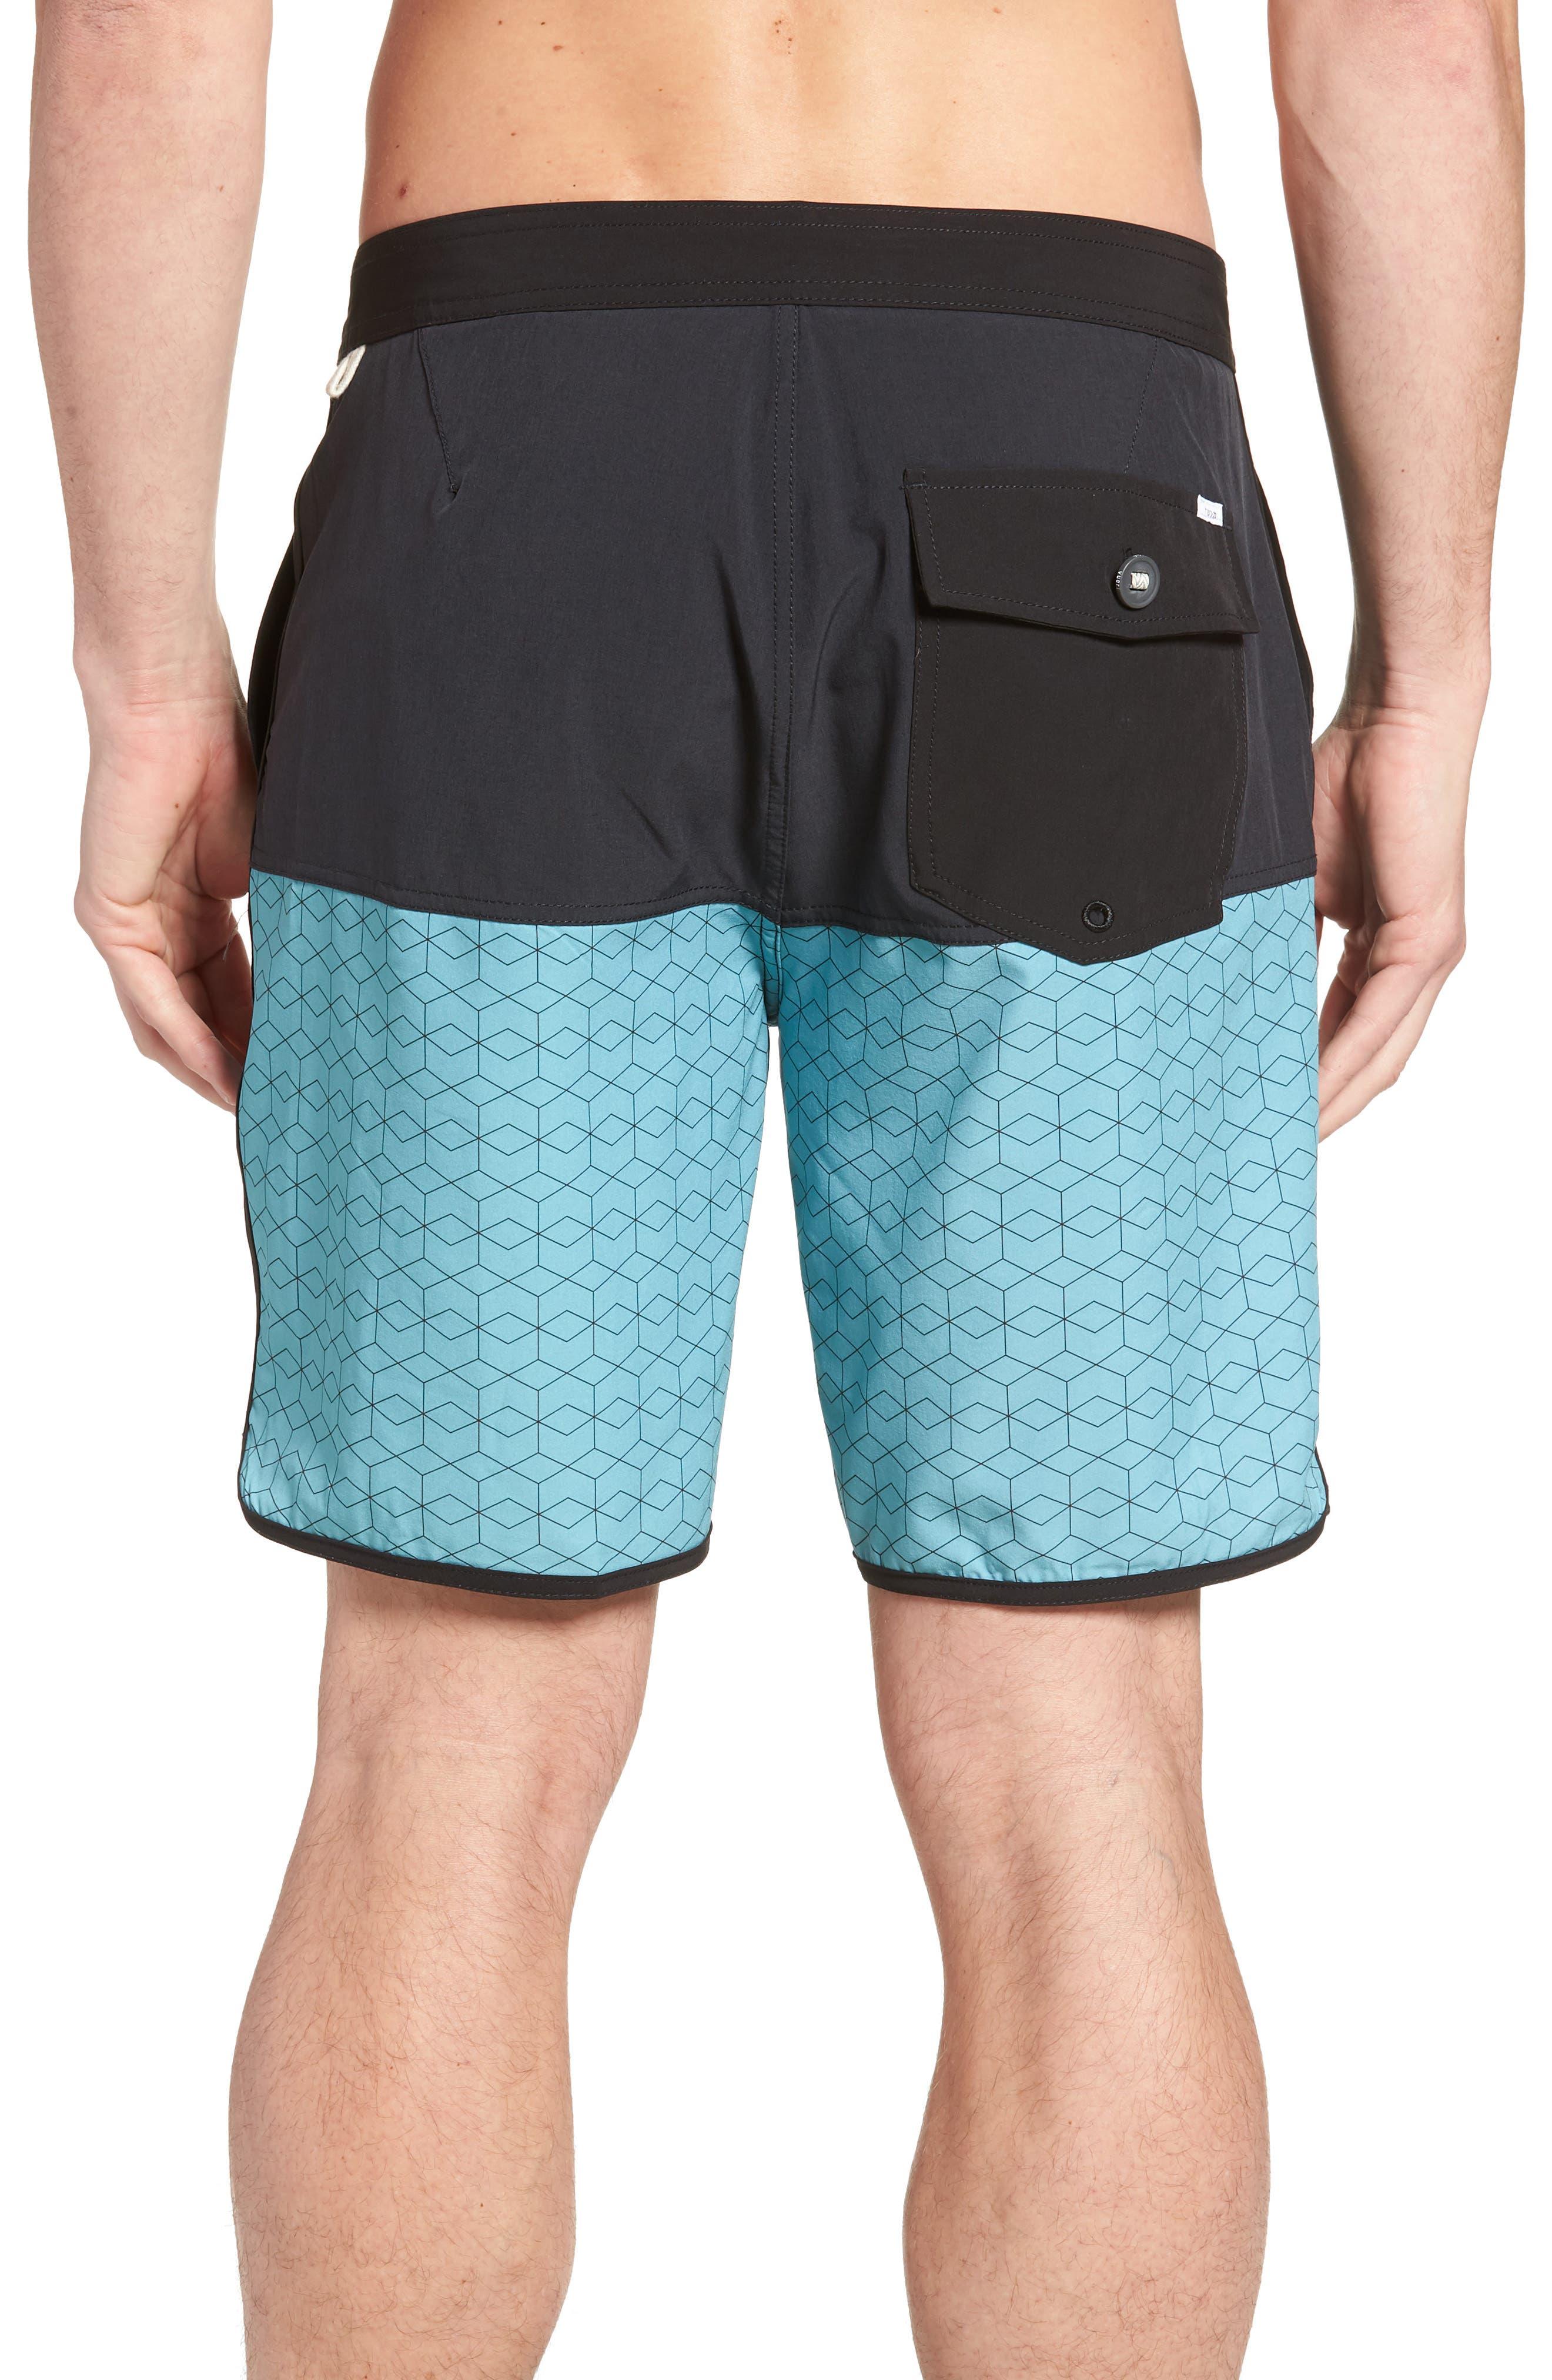 Cruise Hybrid Board Shorts,                             Alternate thumbnail 2, color,                             Glacier Hex Block